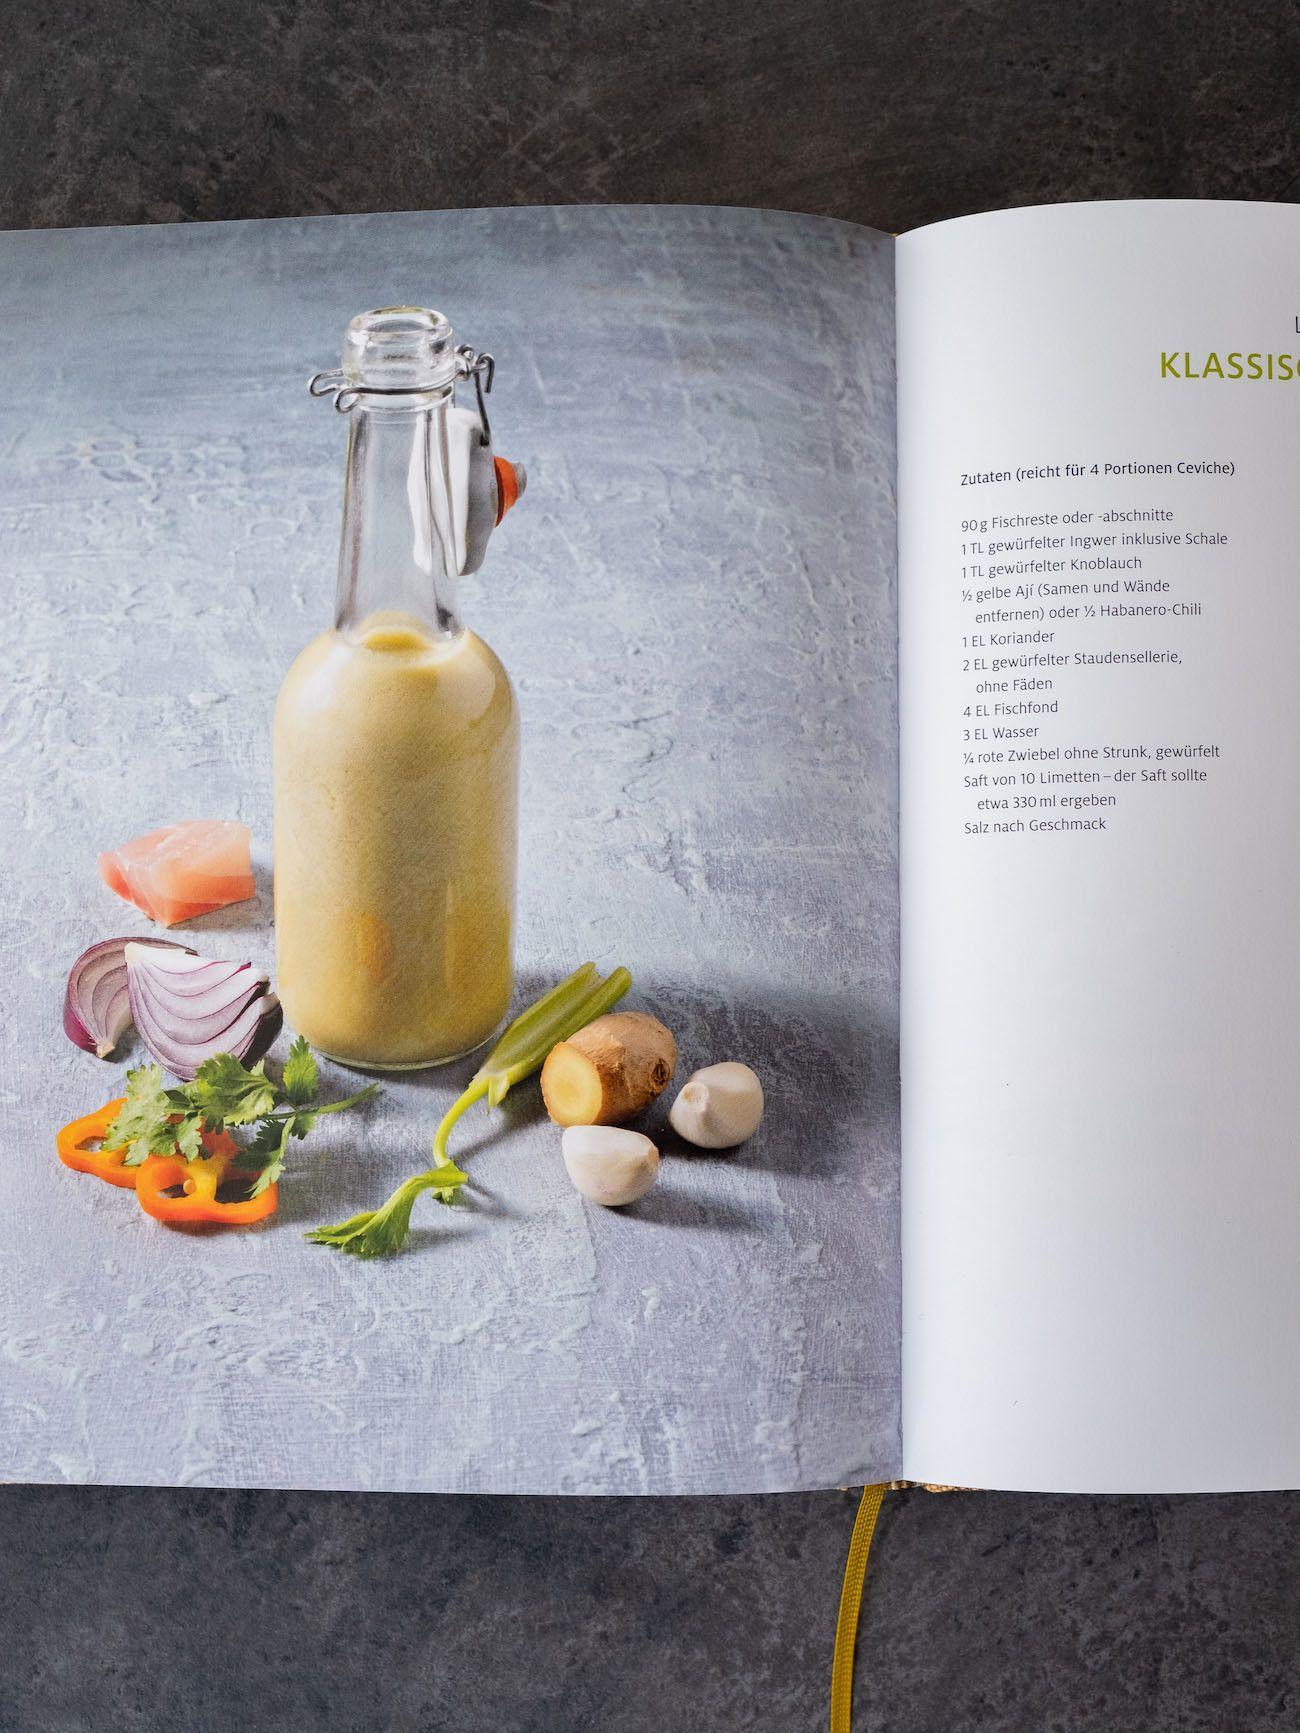 Foodblog, About Fuel, CEVICHE Das Kochbuch, Juan Danilo, Tigermilch, Ingwer, Knoblauch, Koriander